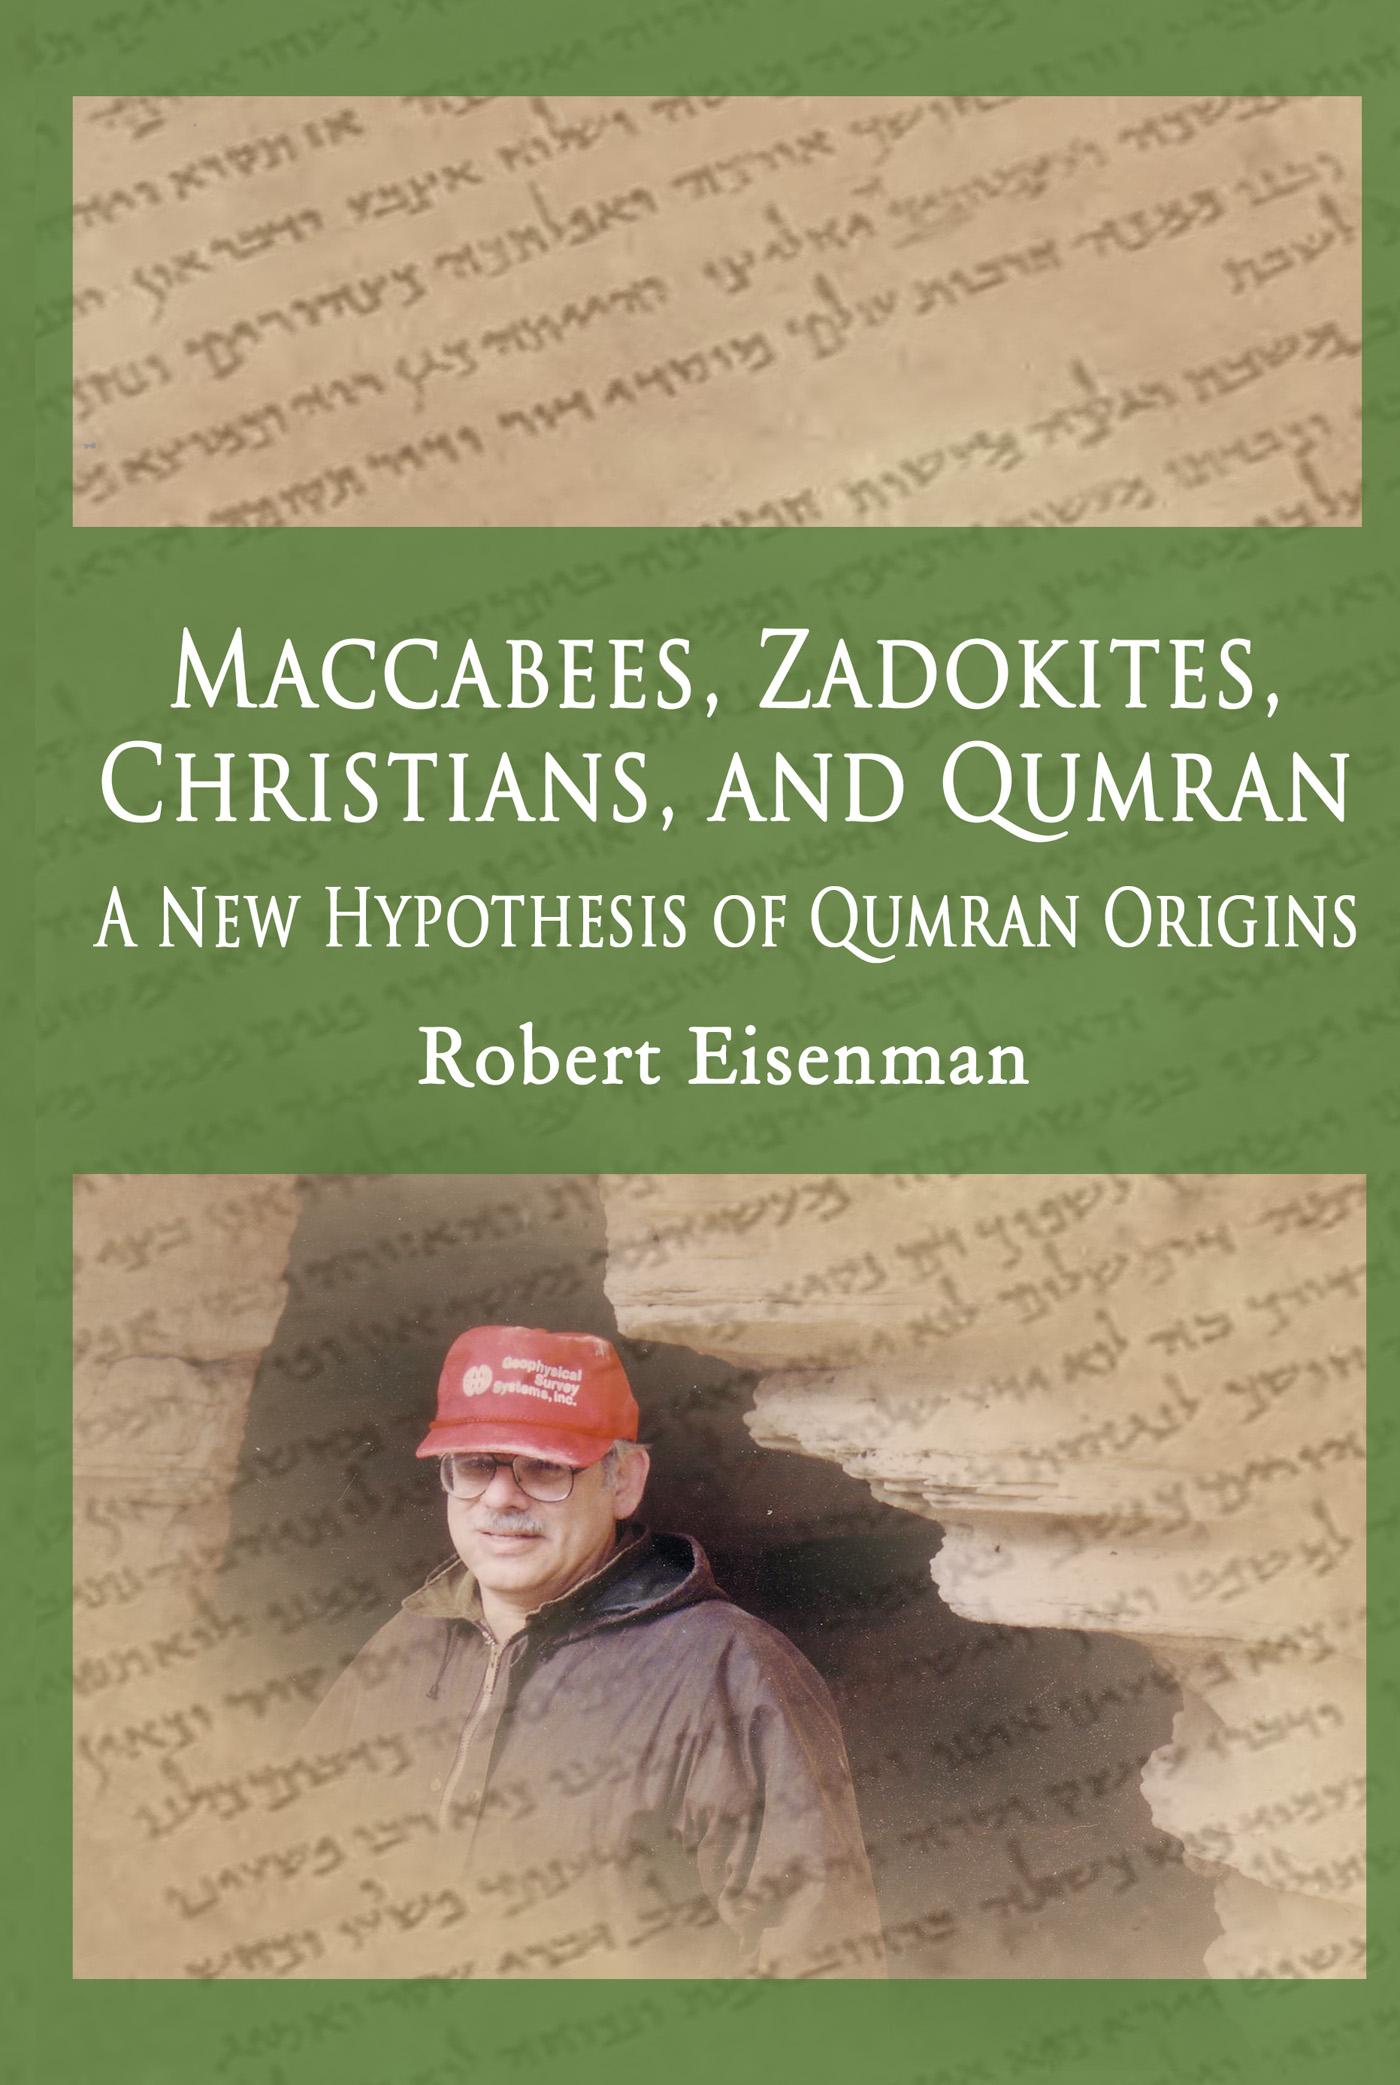 Maccabees, Zadokites, Christians, and Qumran: A New Hypothesis of Qumran Origins